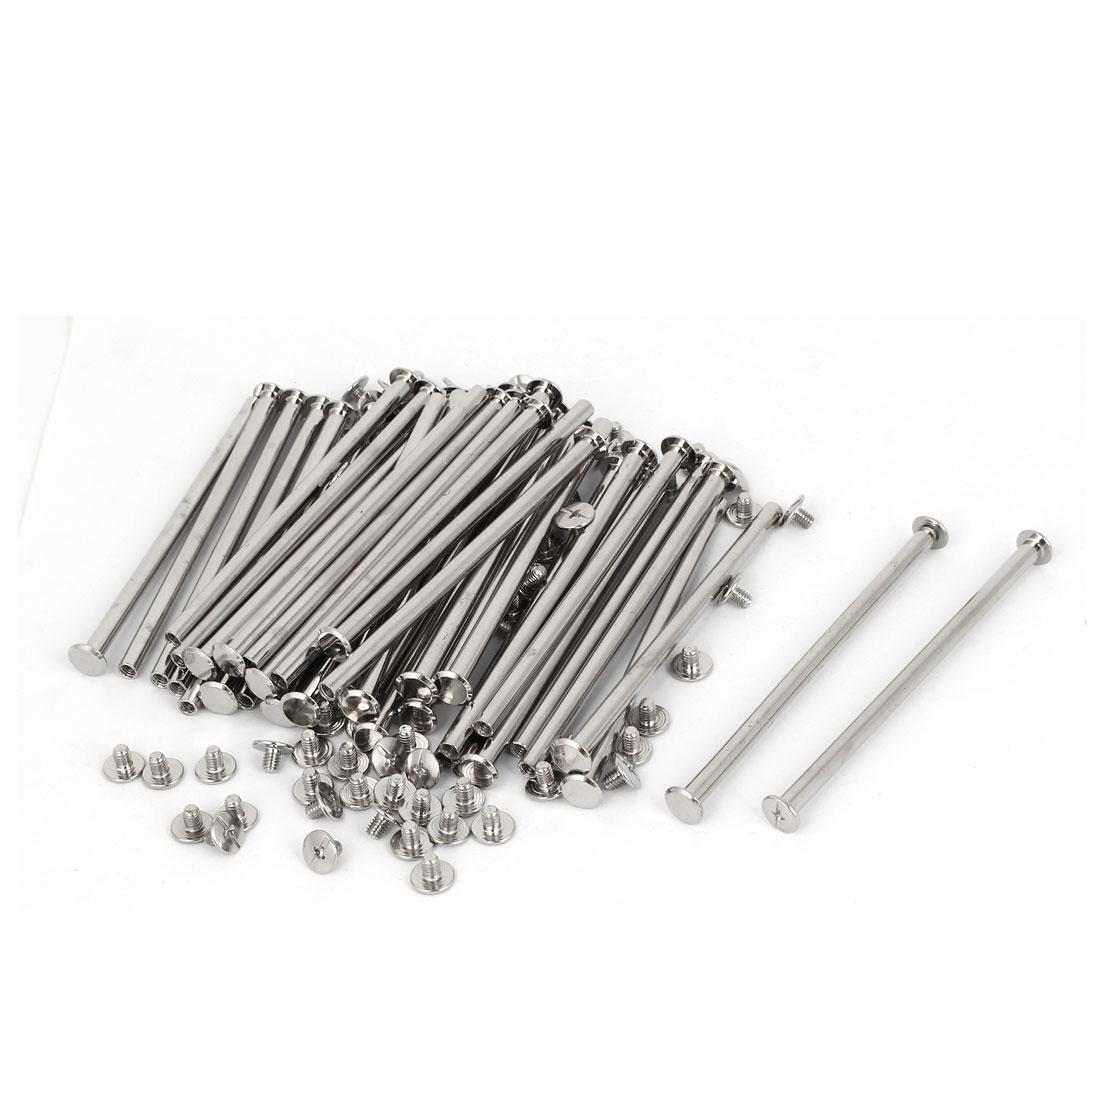 M5 x 100mm Photo Albums Aluminum Binding Screw Post Silver Tone 50pcs